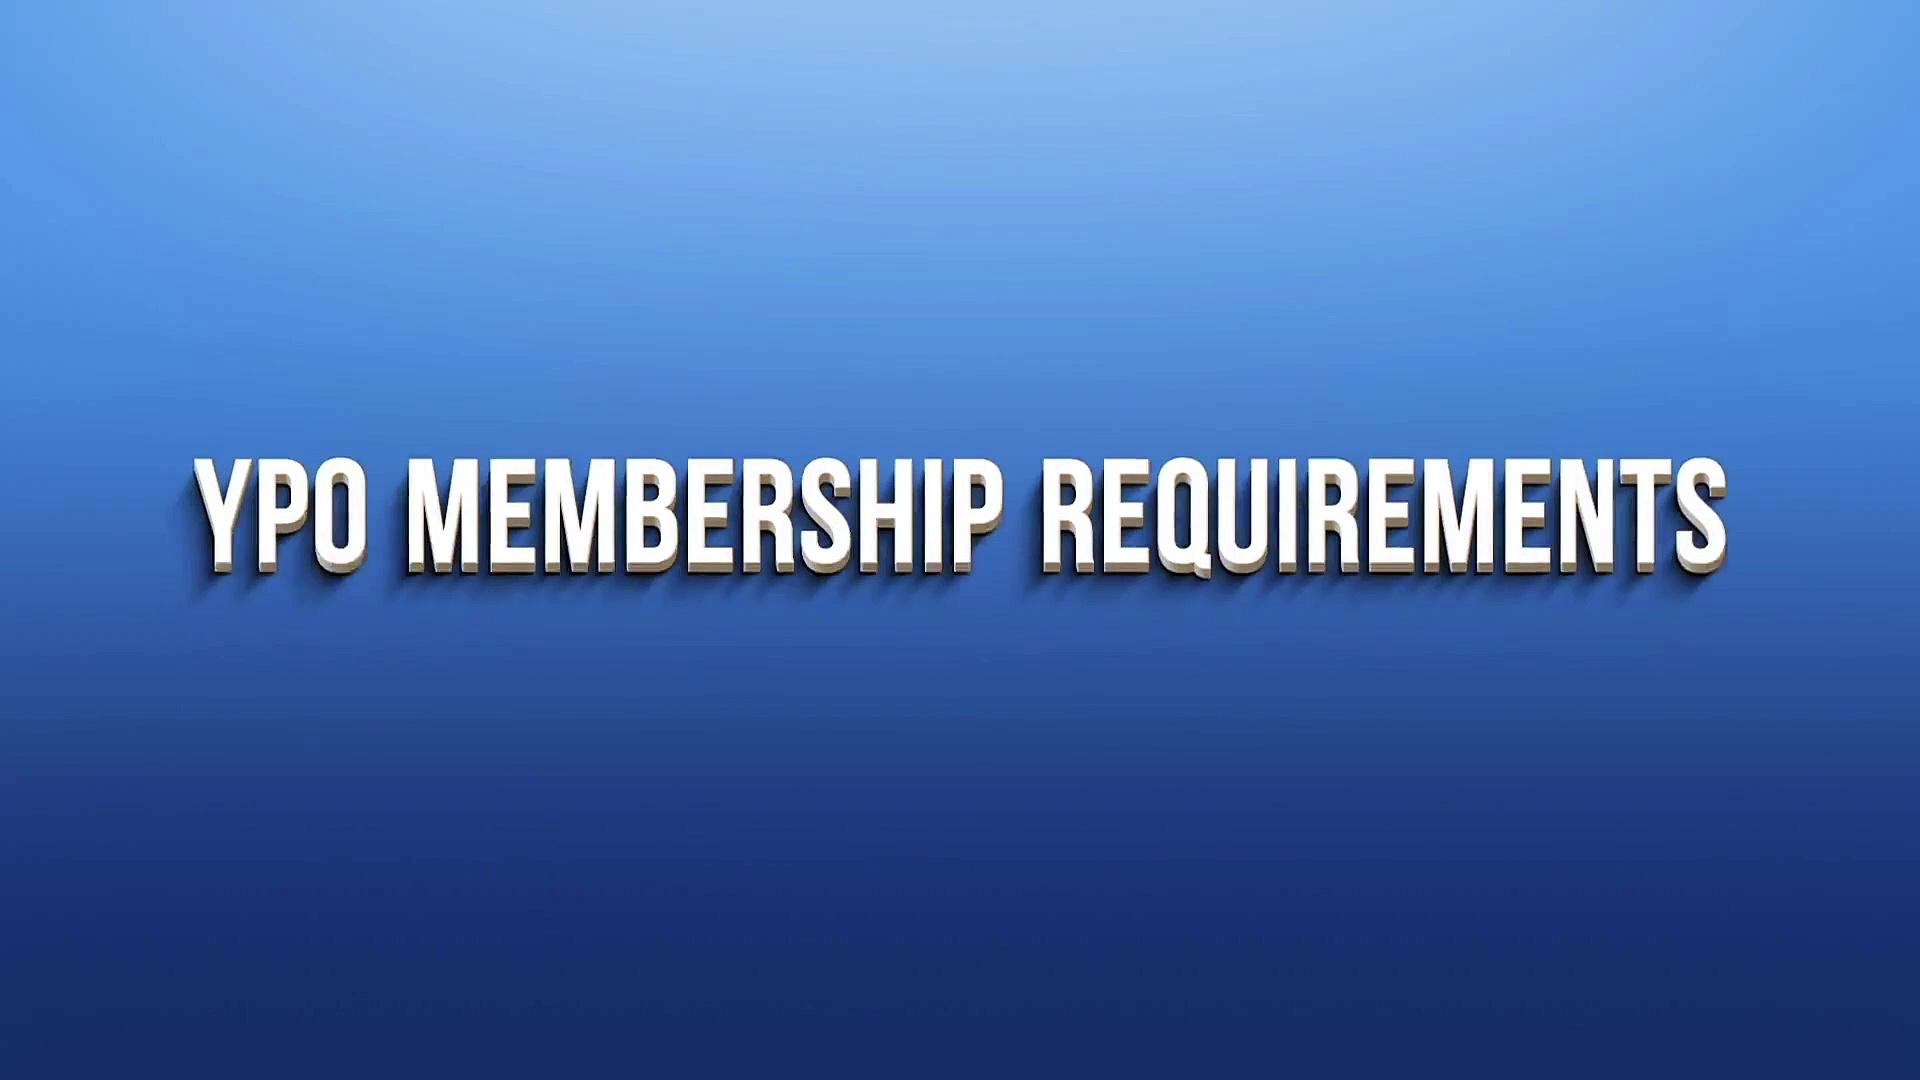 YPO Membership Requirements